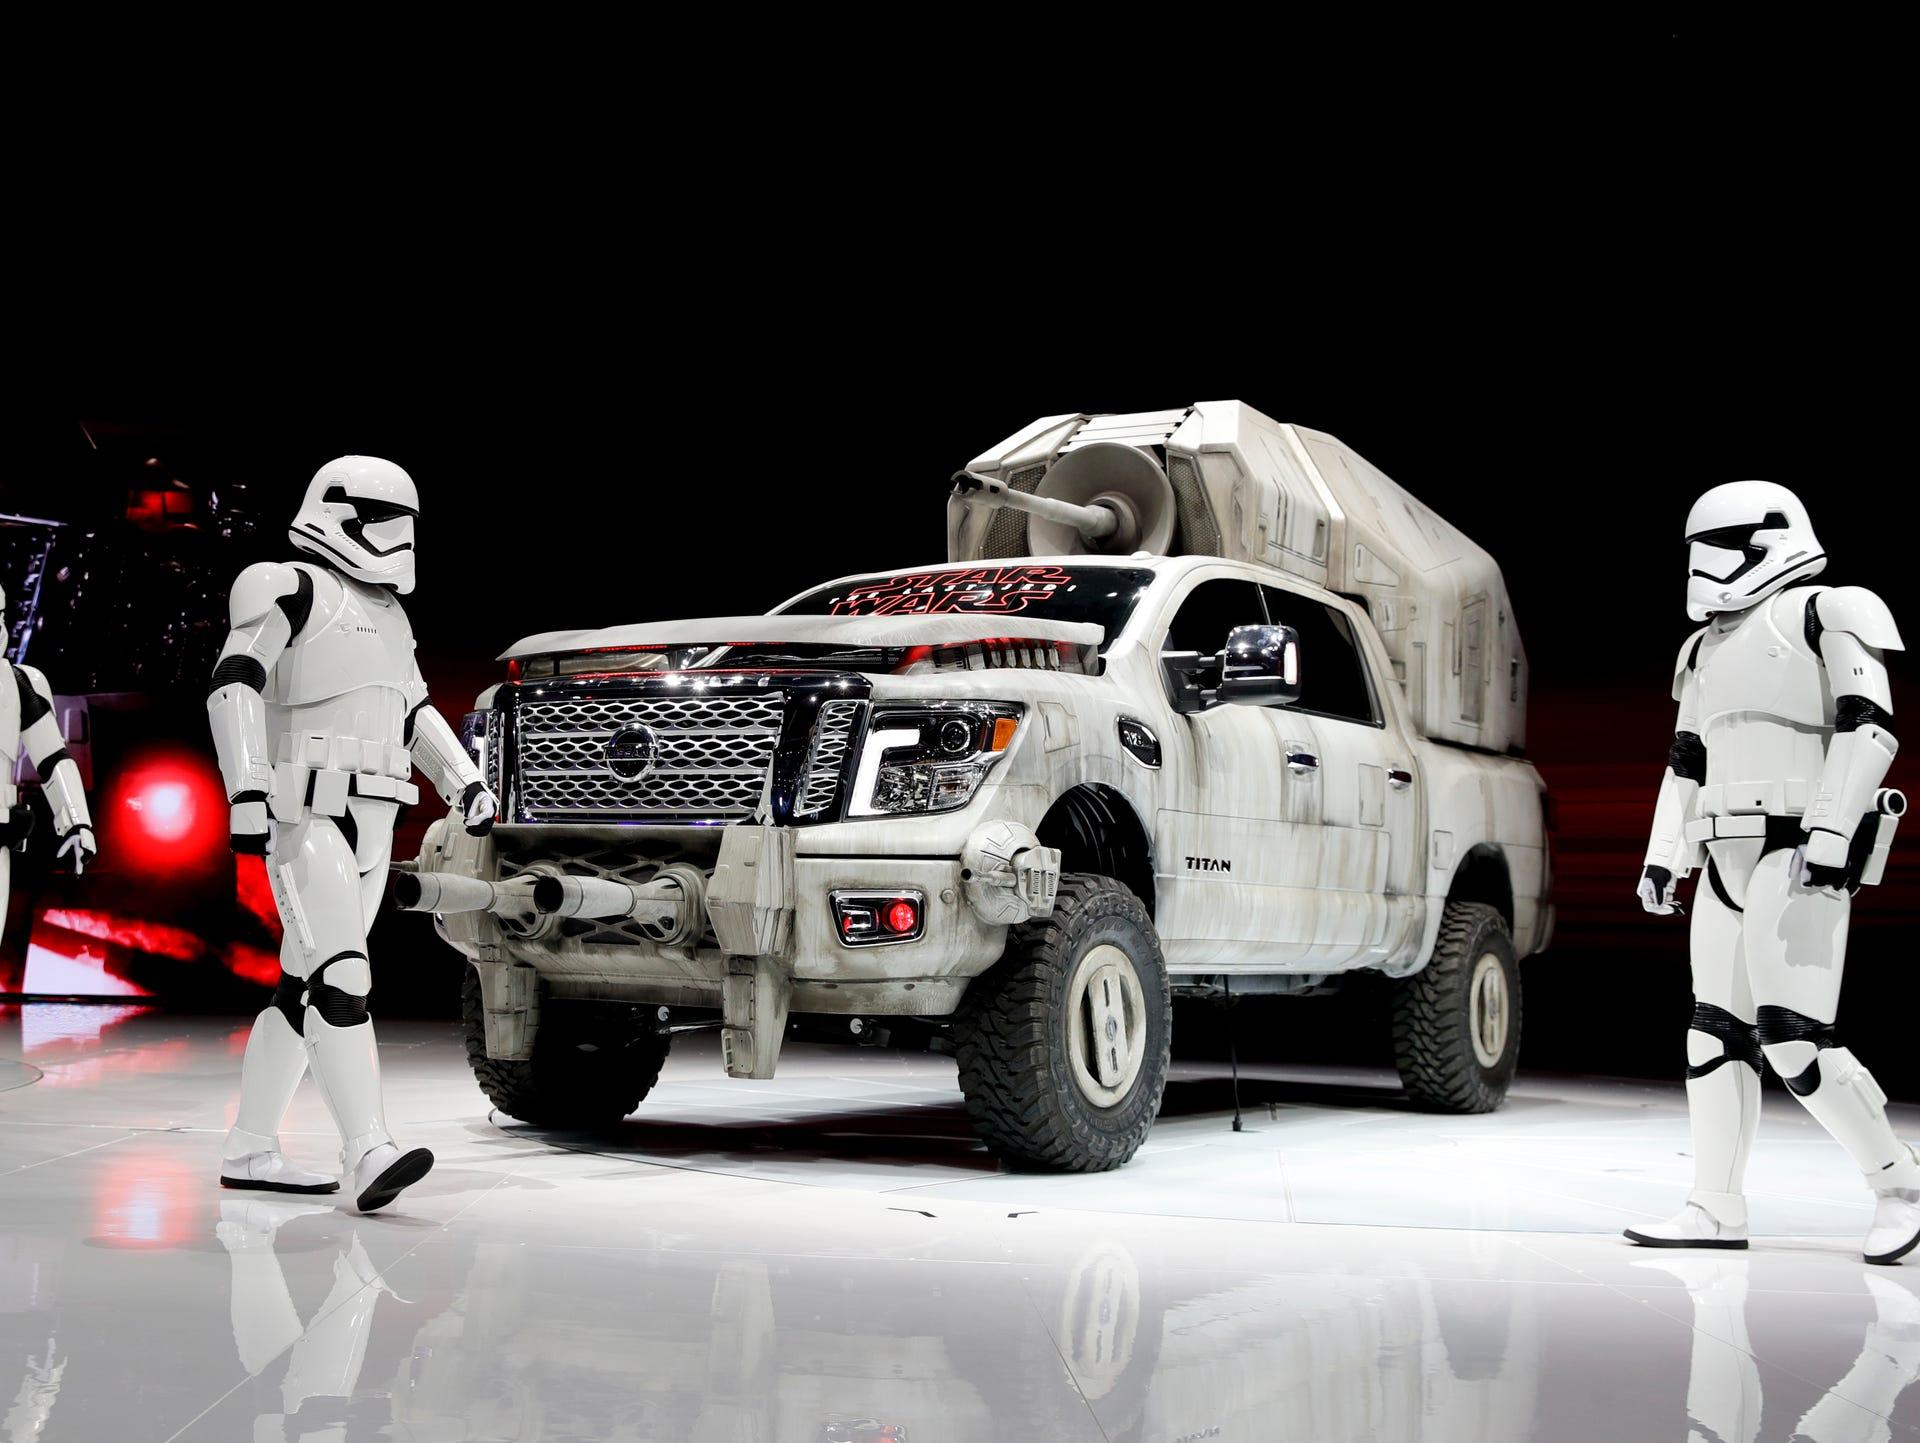 Nissan unveils its Star Wars vehicles